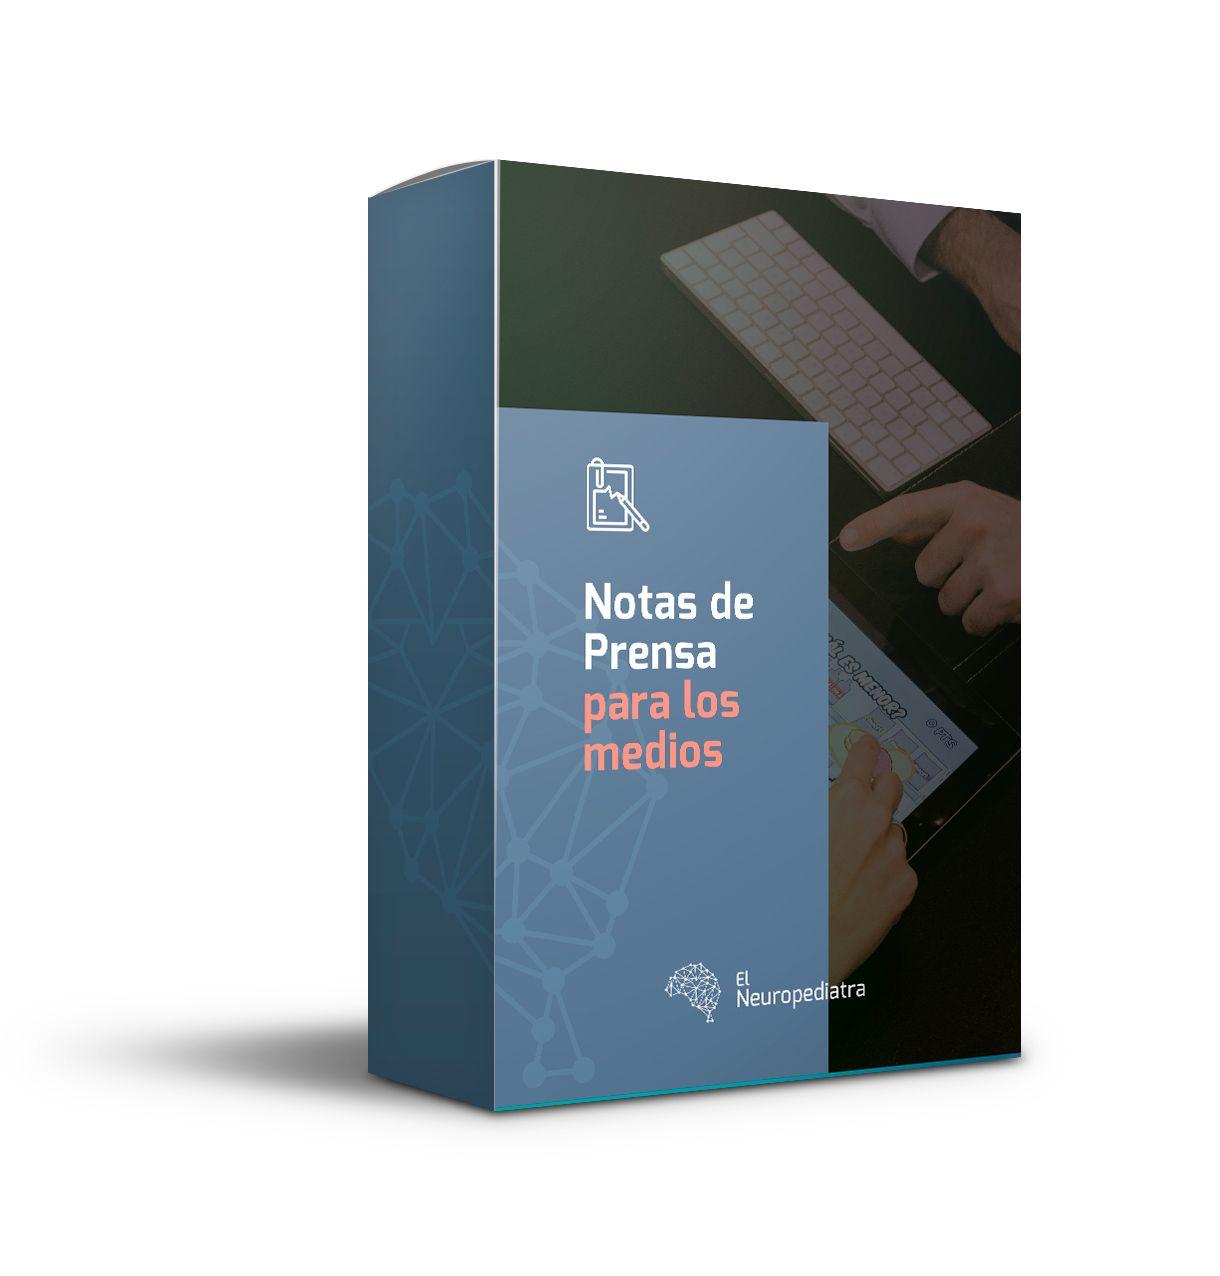 Dosier de prensa el neuropediatra